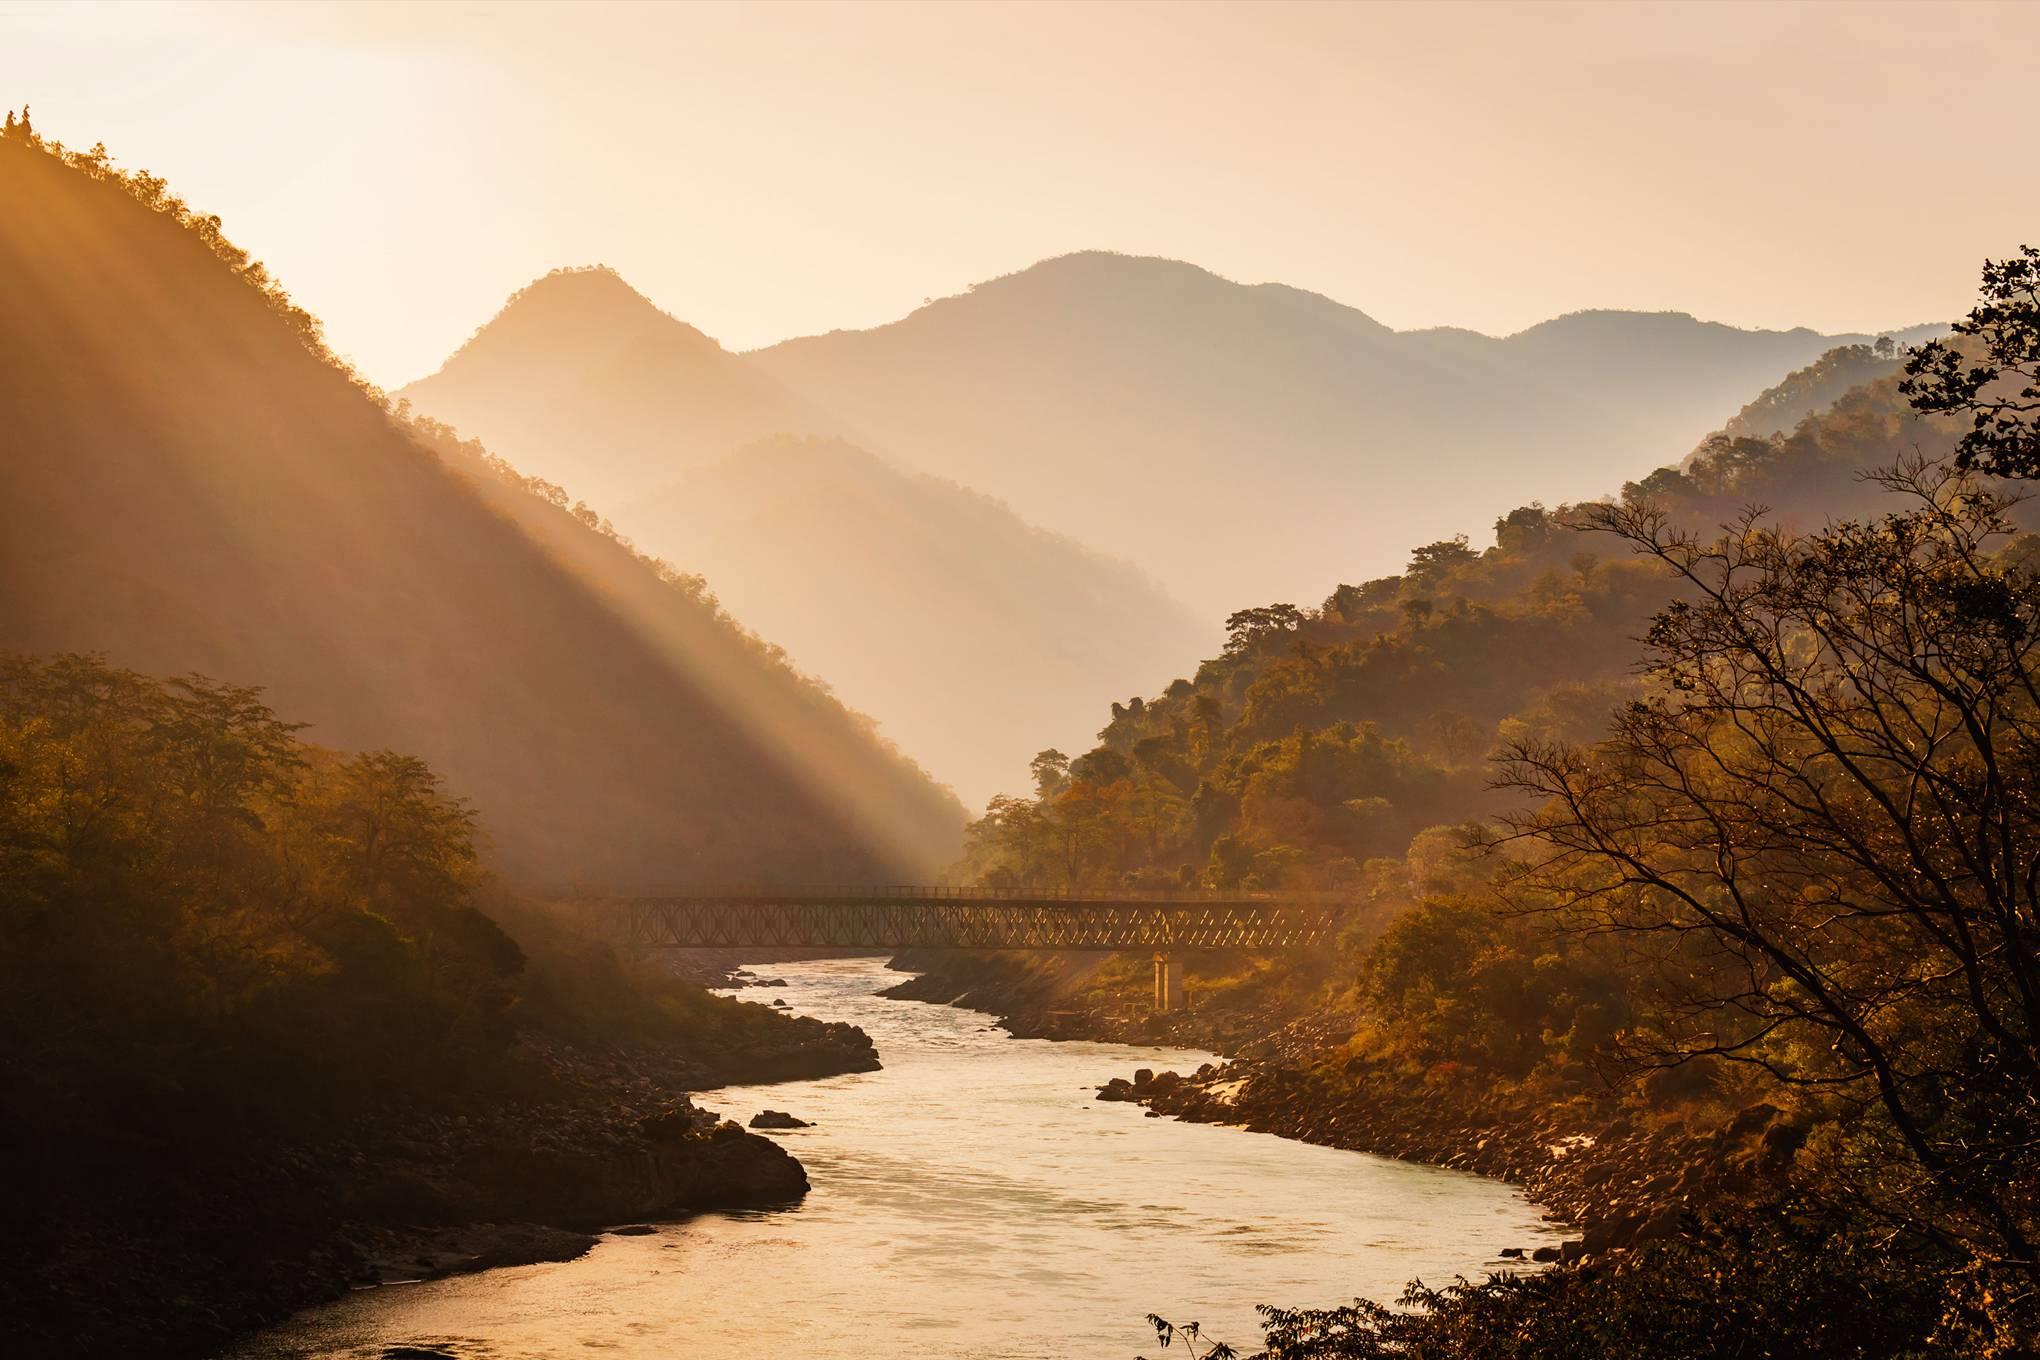 A secret sanctuary hidden in the Himalayas